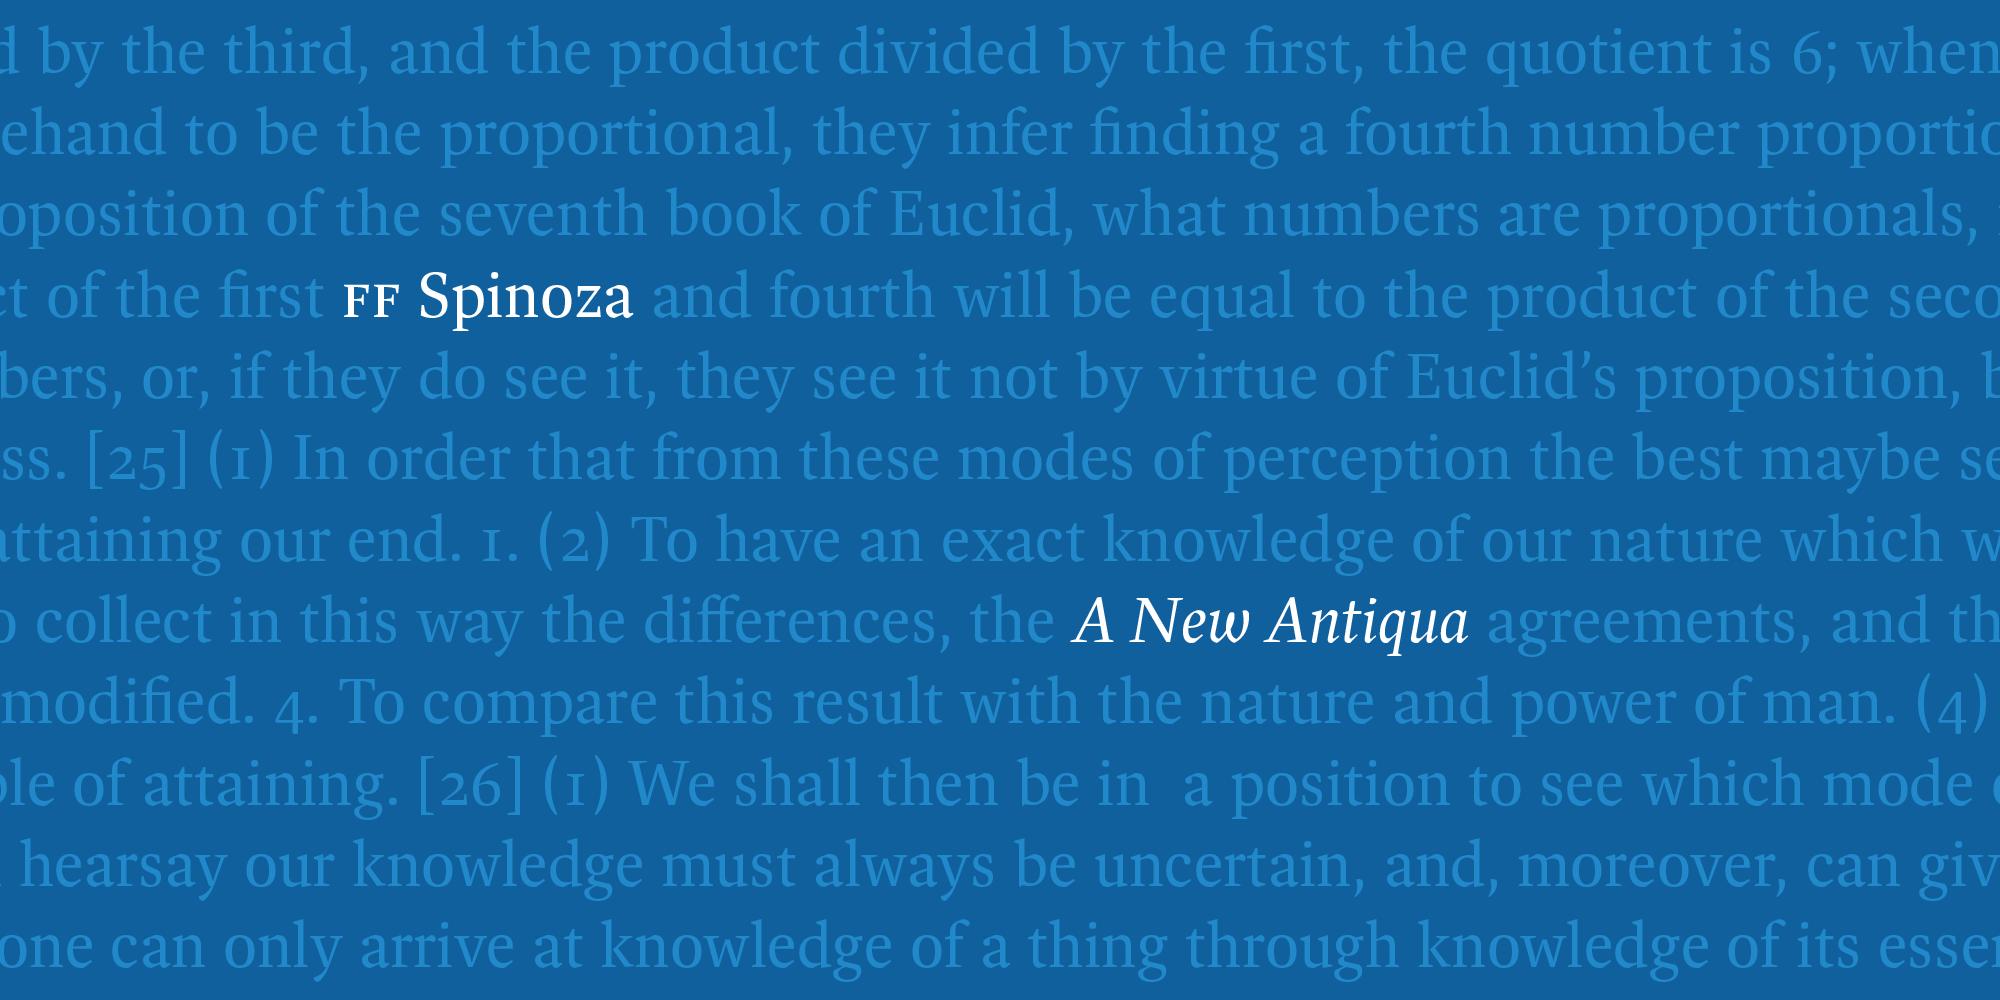 Cover image: FF Spinoza (2011)